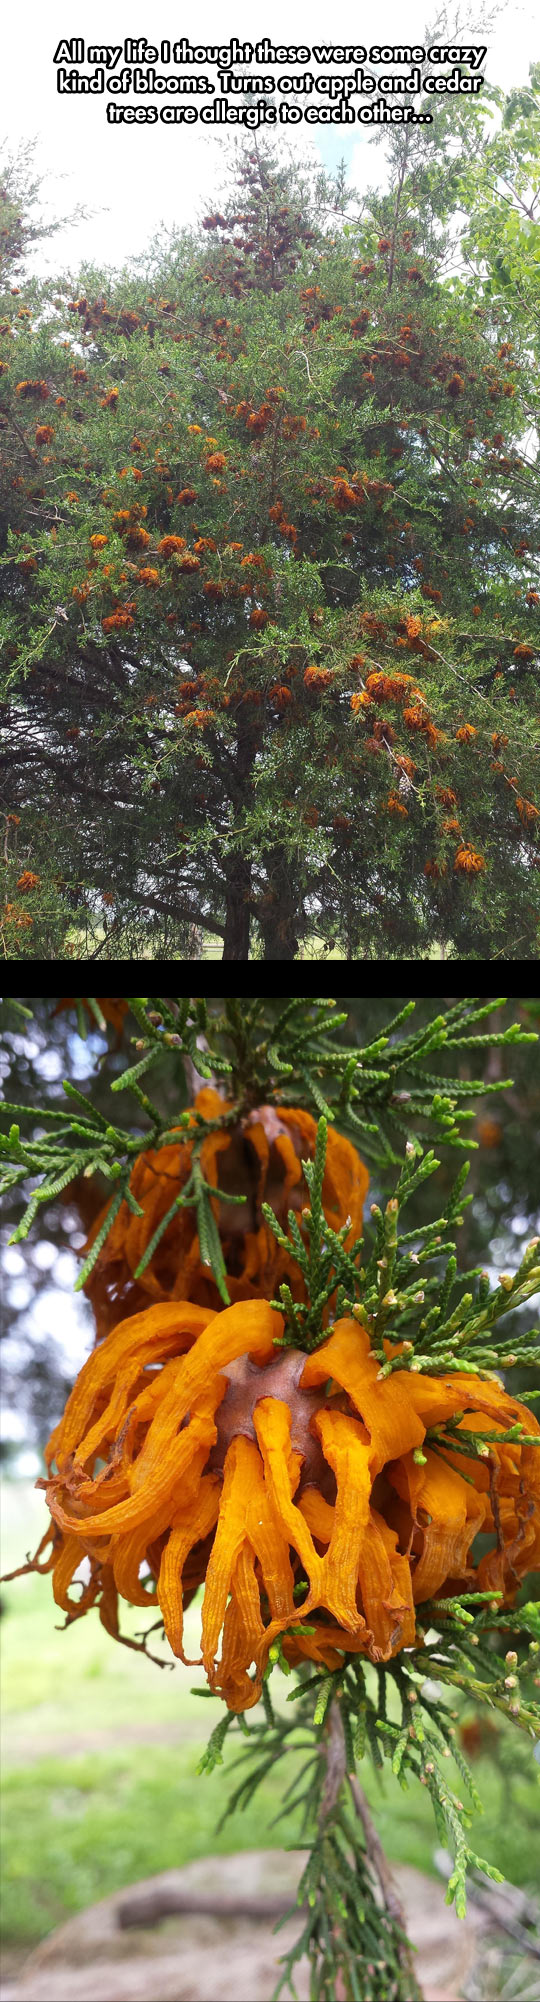 funny-apple-cedar-rust-tree